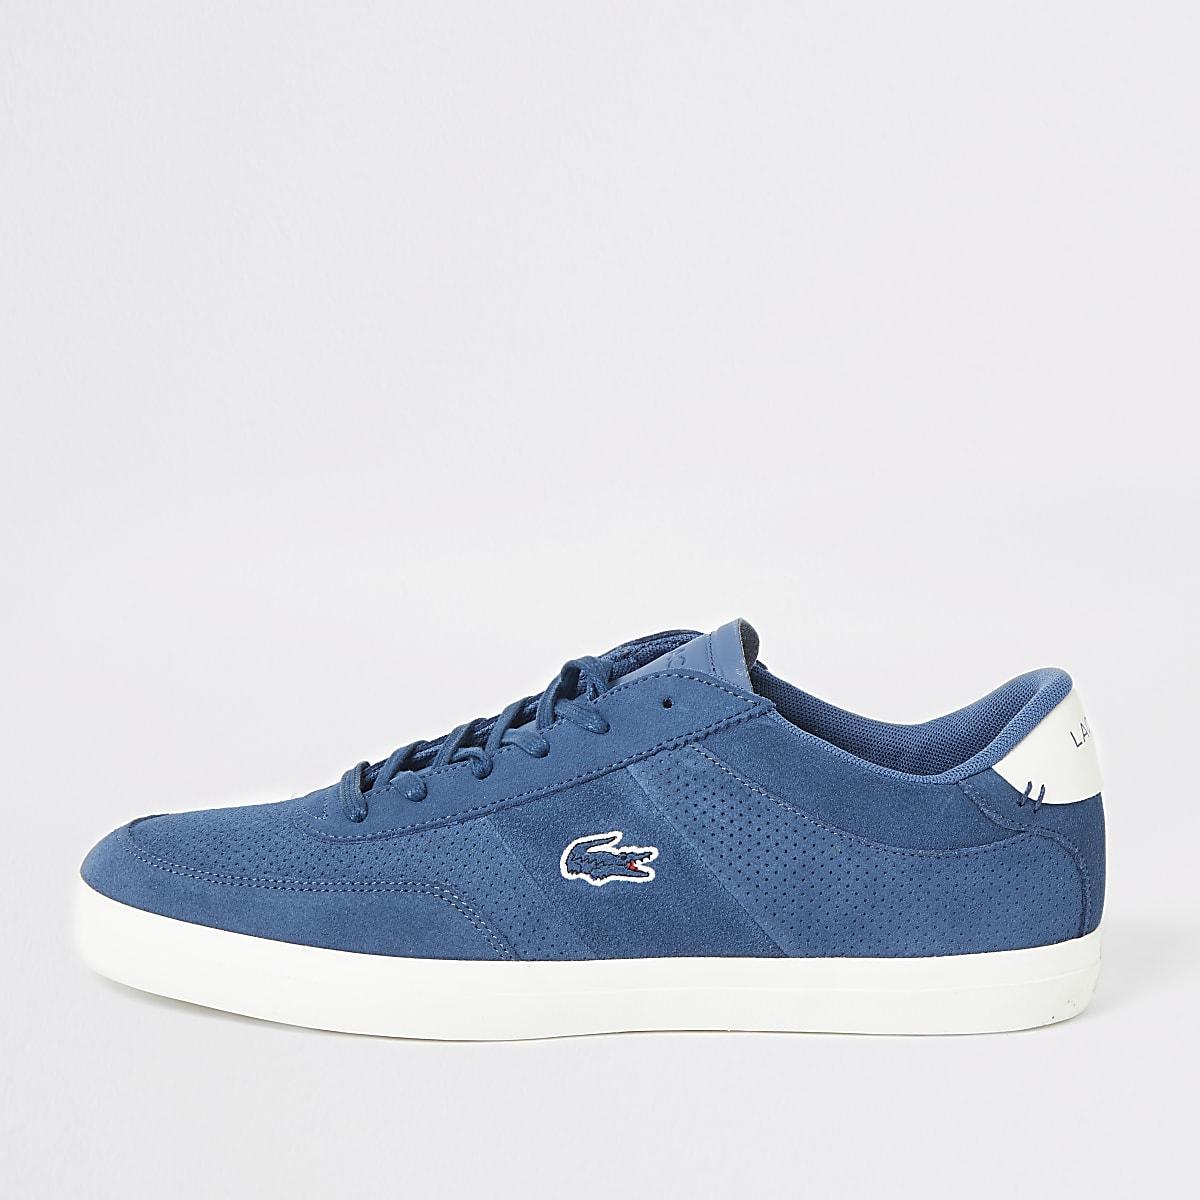 Lacoste Courtmaster - Blauwe sneakers